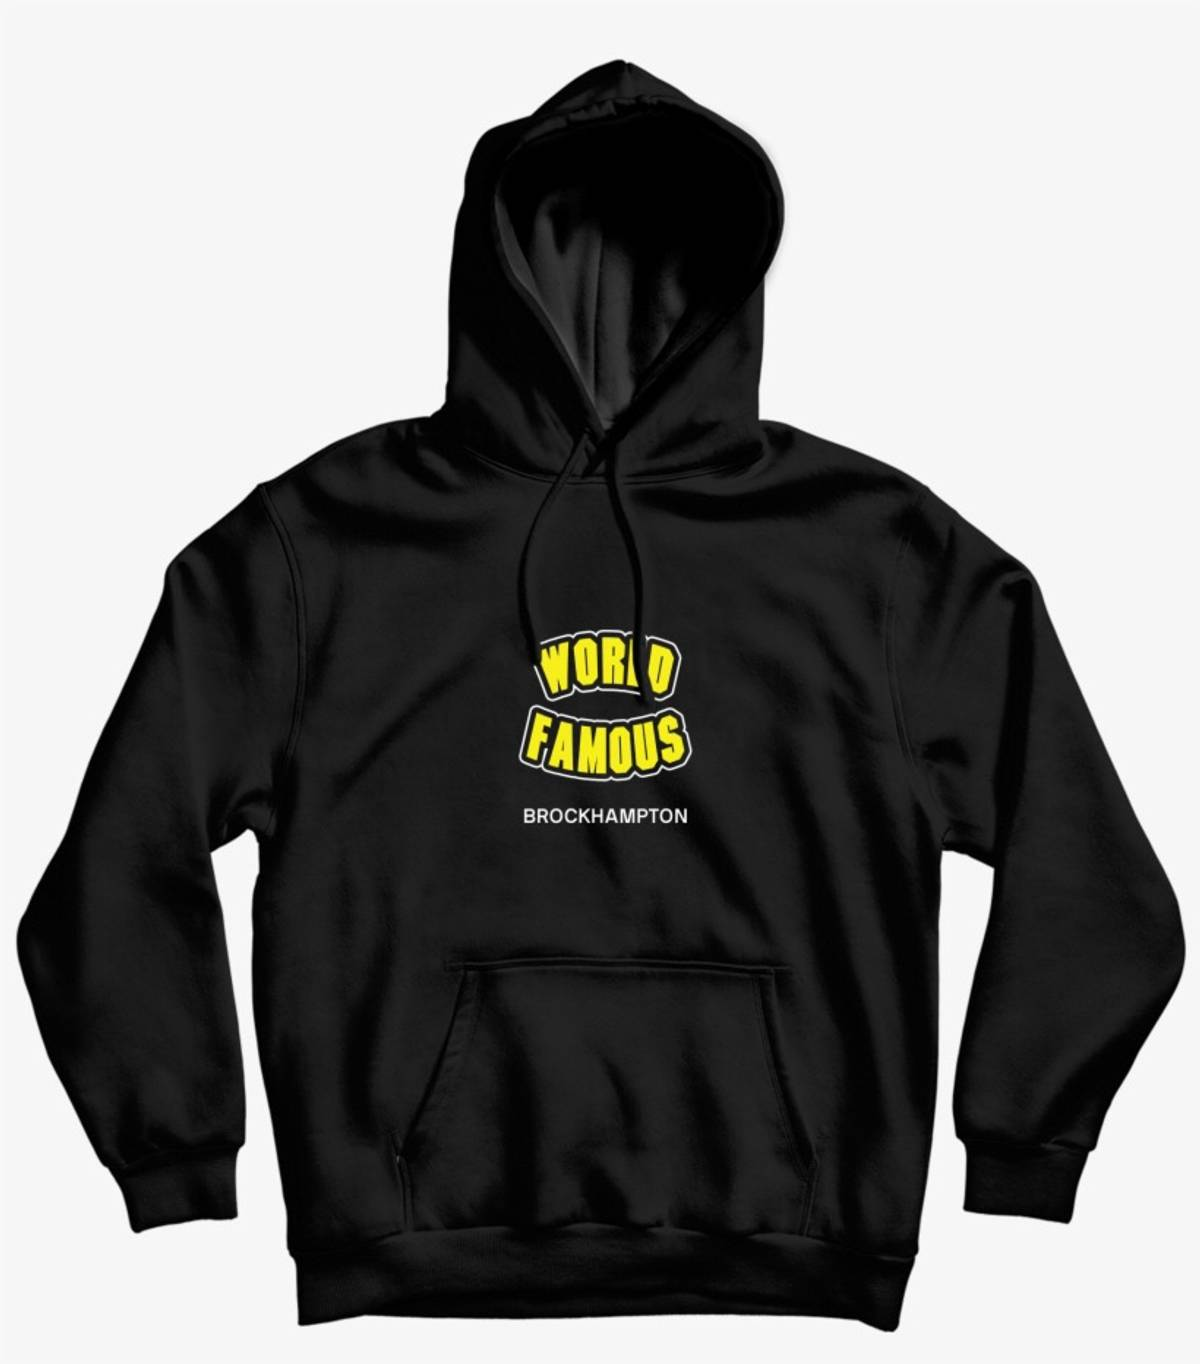 BROCKHAMPTON Couch logo American musical Rap Hip Hop Mens Hoodie S to 3XL